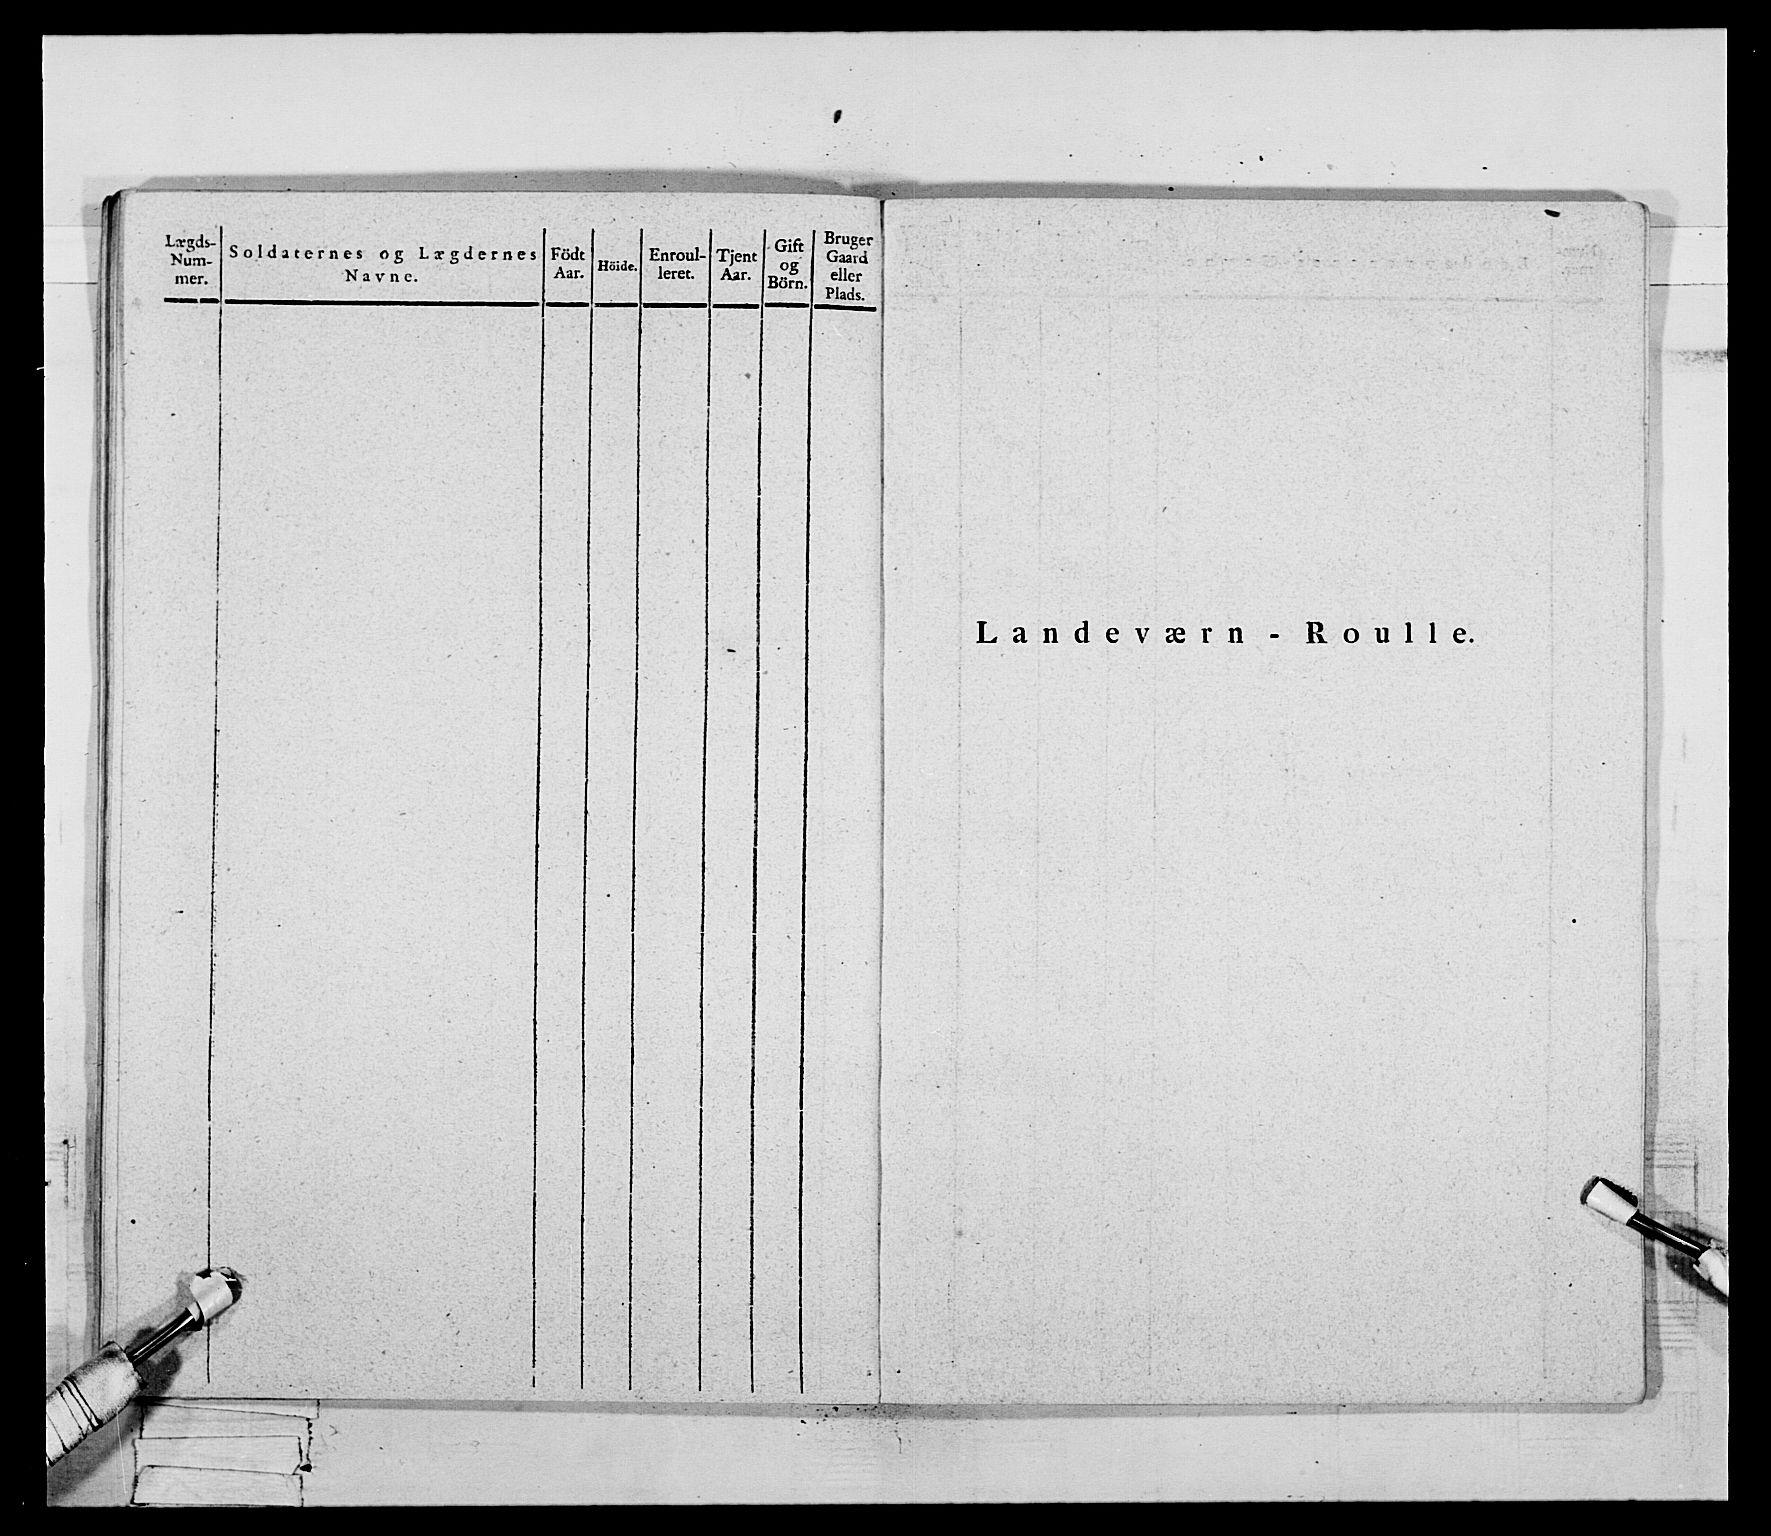 RA, Generalitets- og kommissariatskollegiet, Det kongelige norske kommissariatskollegium, E/Eh/L0069: Opplandske gevorbne infanteriregiment, 1810-1818, s. 498